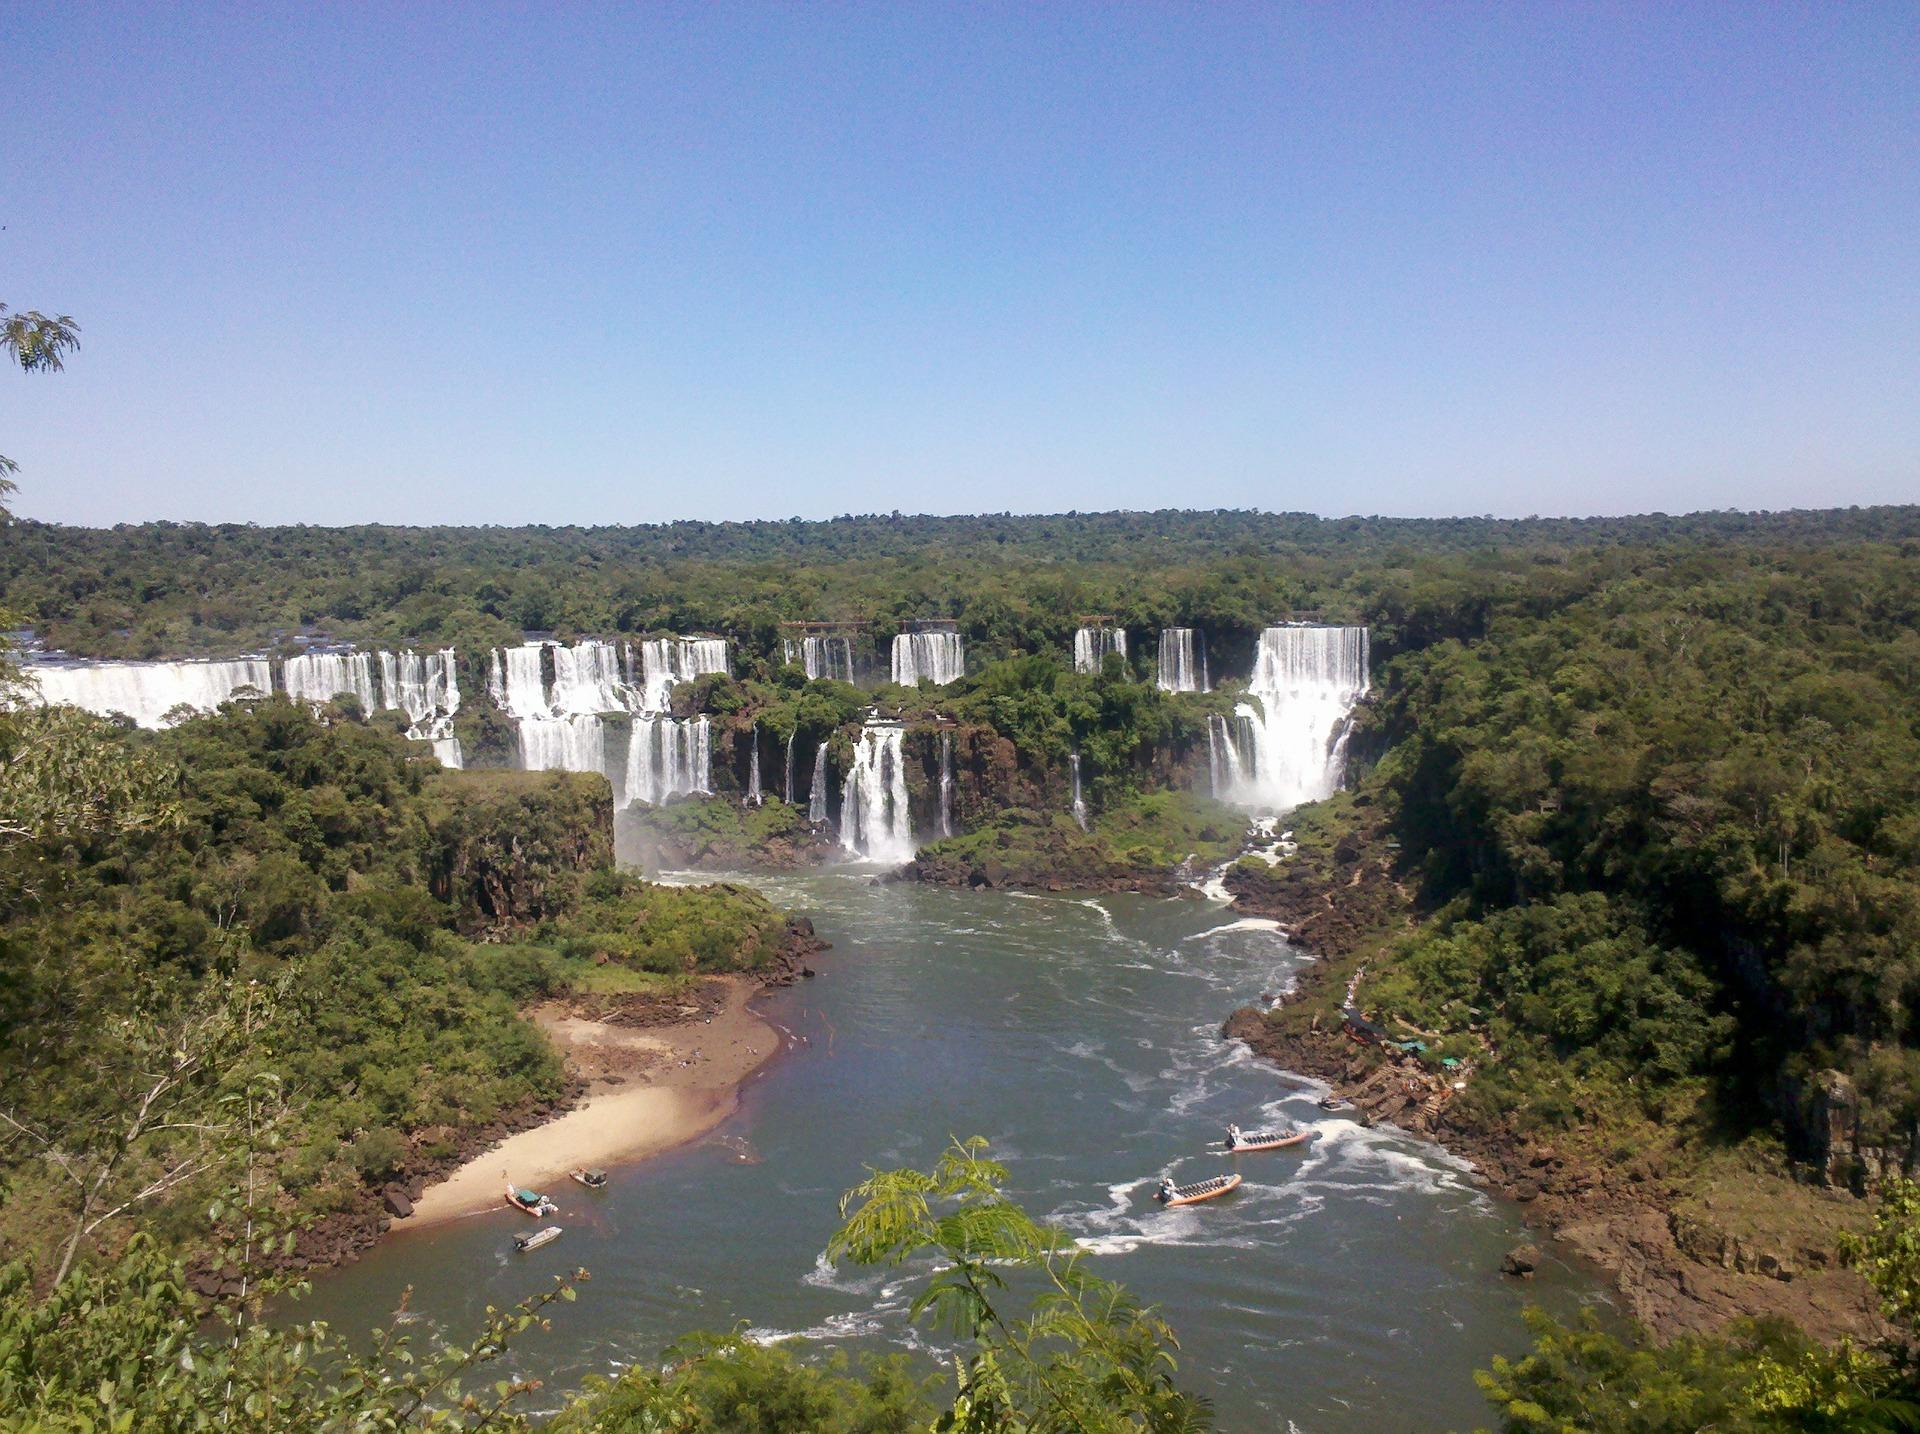 Iguazu Falls, border of Argentina and Brazil